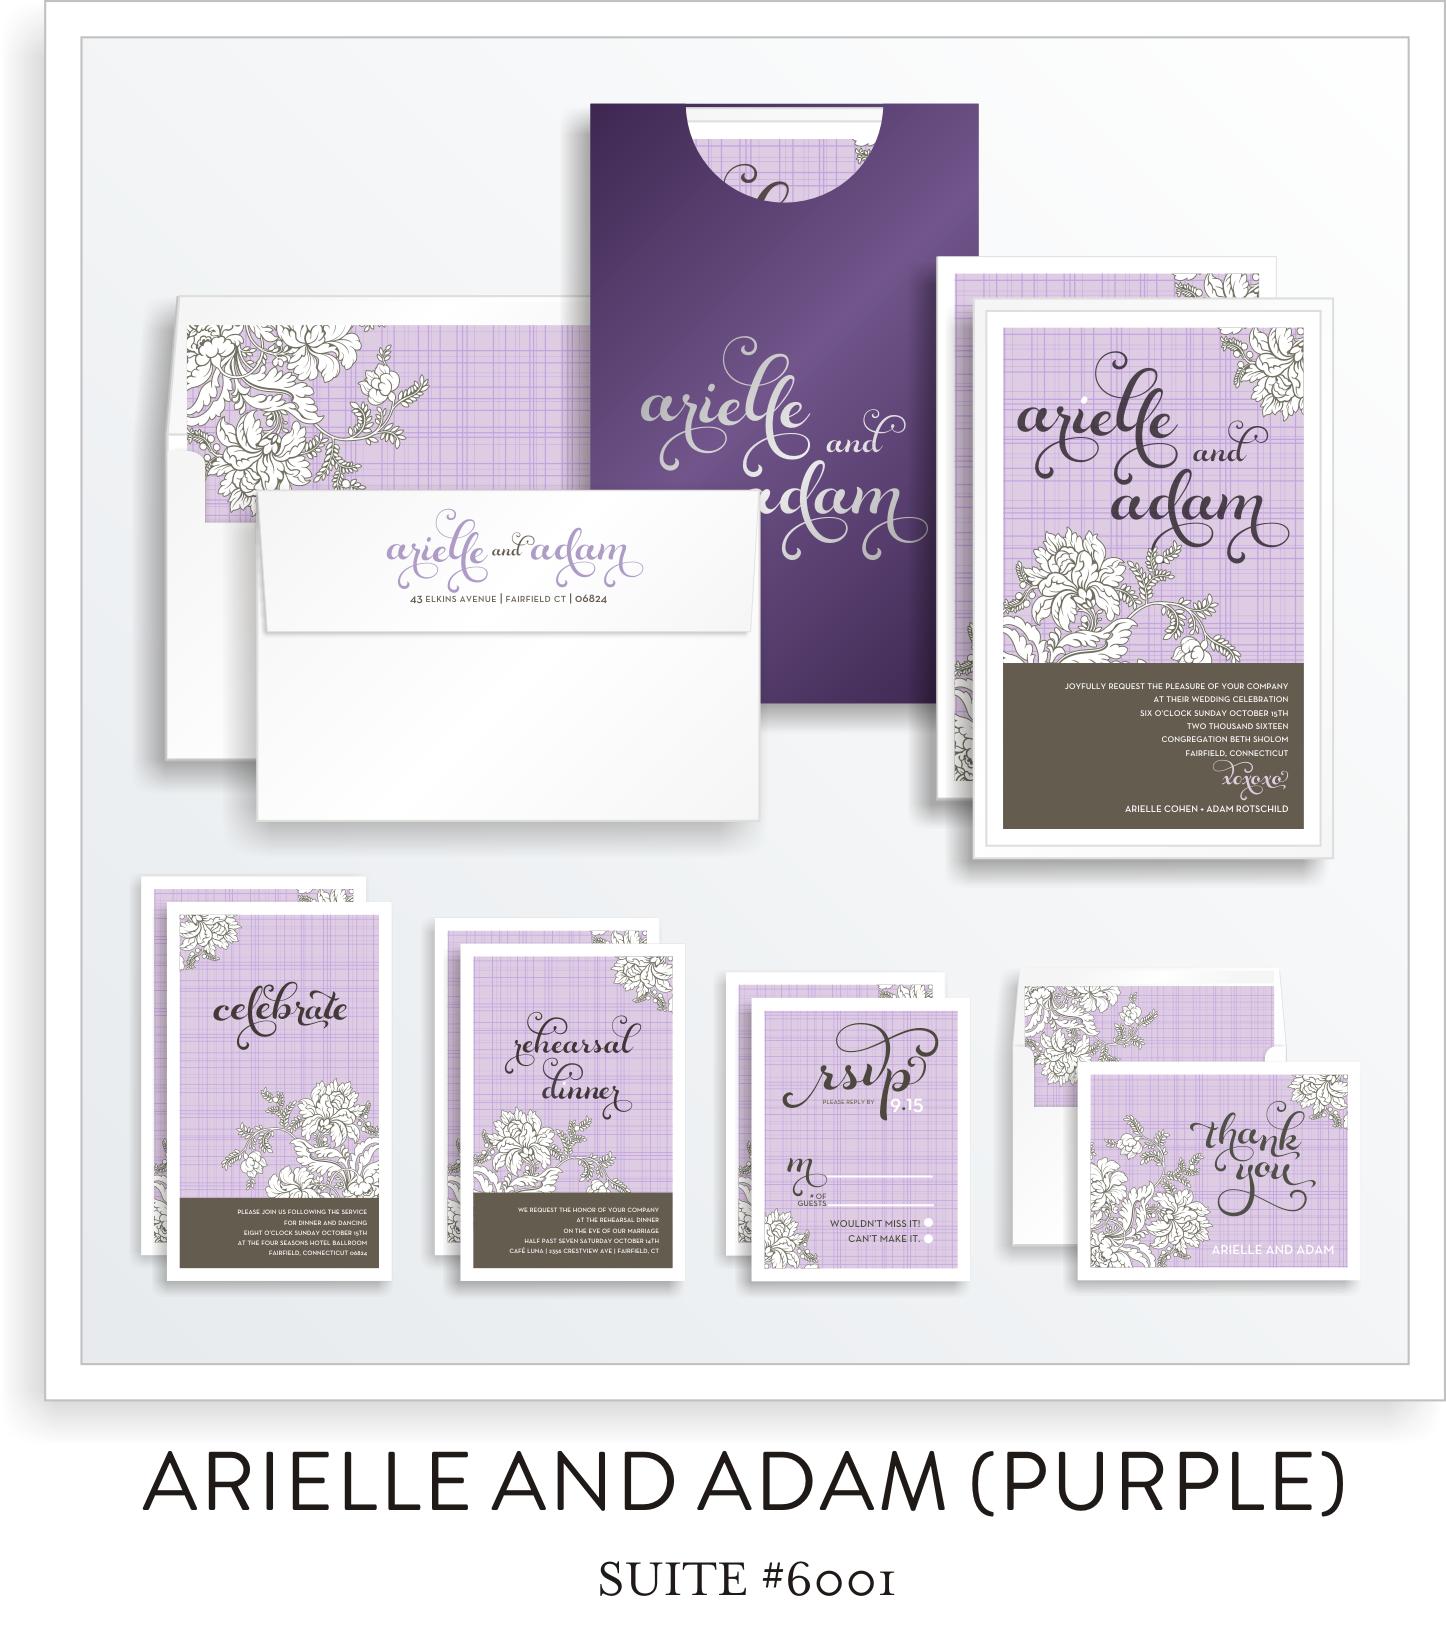 6001 purple